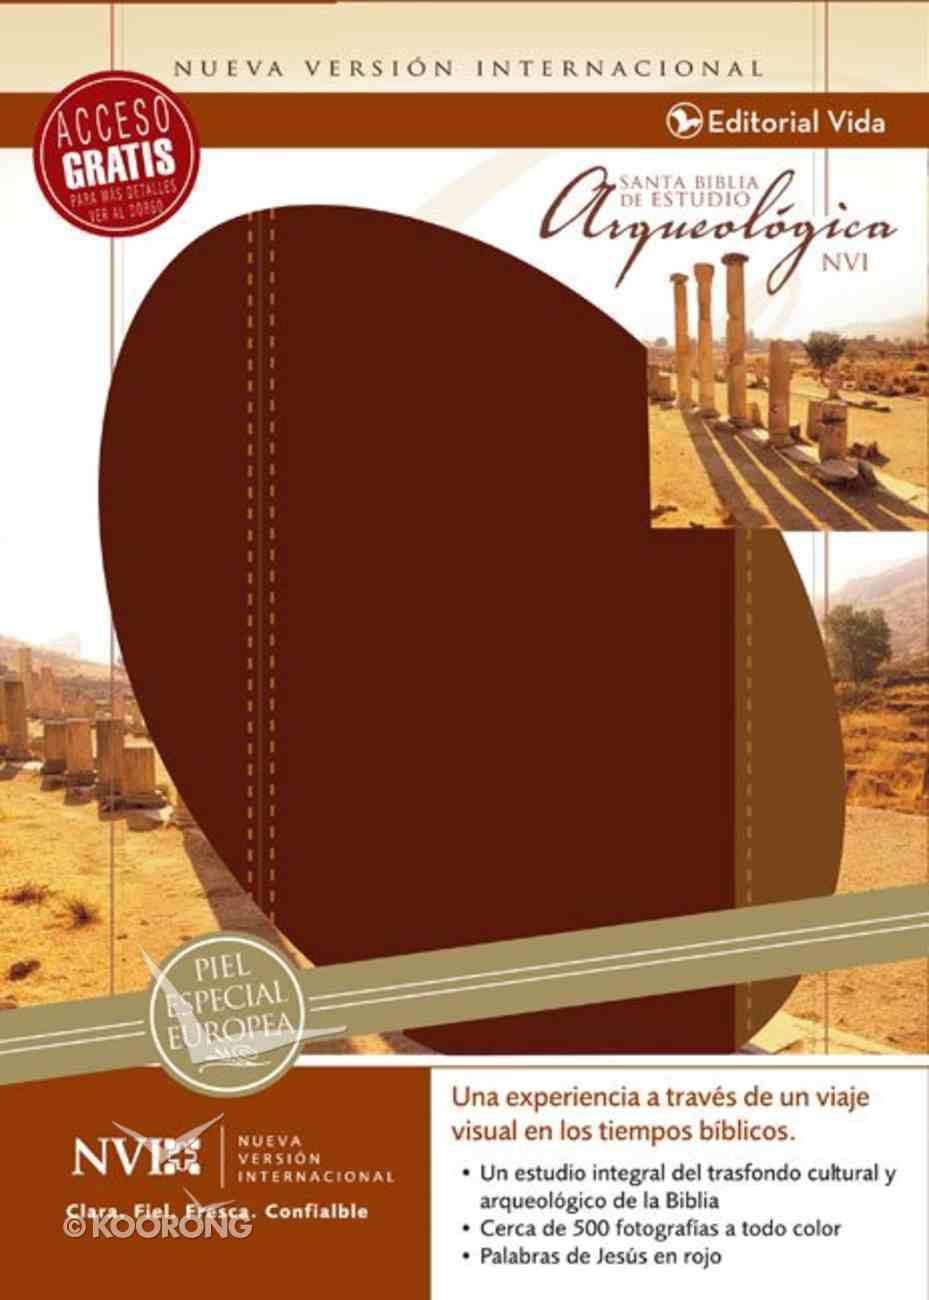 Nvi Santa Biblia De Estudio Arqueolgica (Red Letter Edition) (Nvi Archaeological Study Bible) Imitation Leather